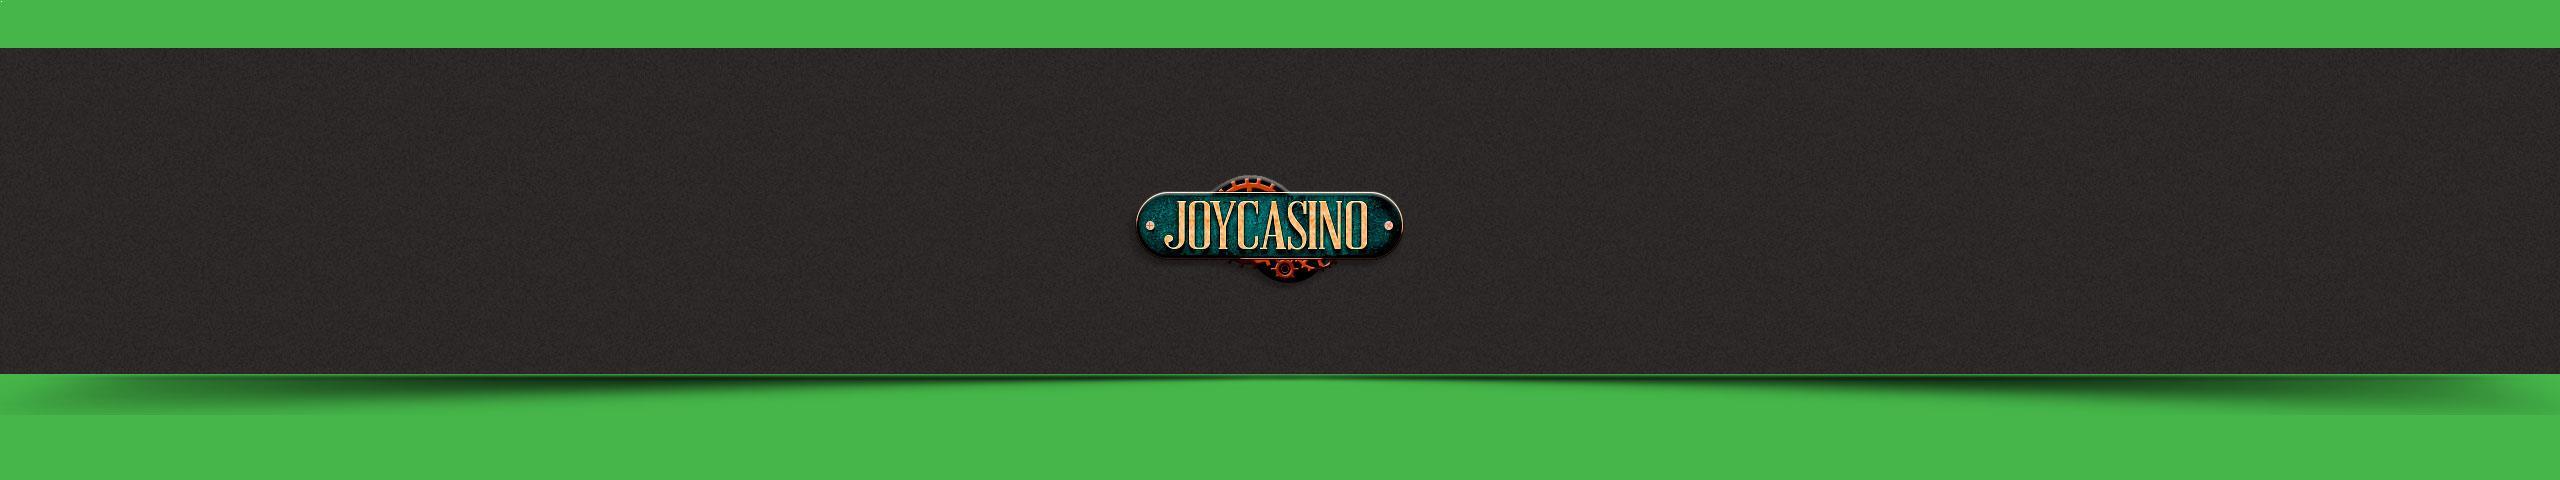 Joycasino Vizualizarea Casino-ului Casino Multa Bafta Slider